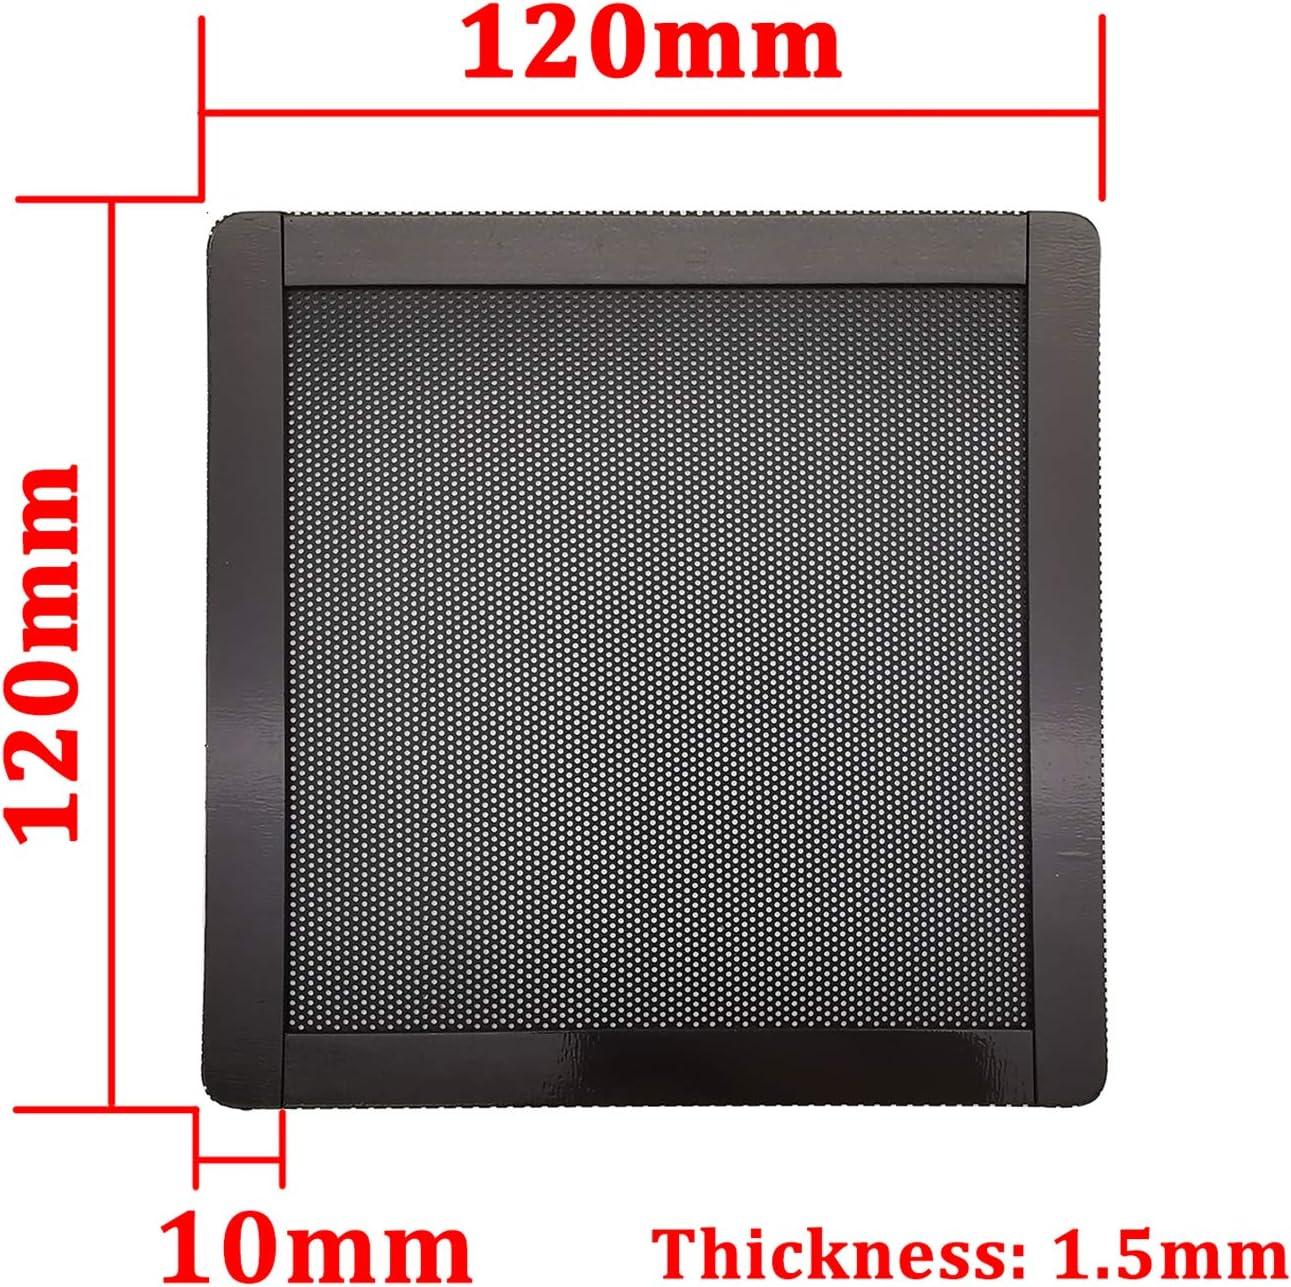 120mm PC Computer Case Fan Magnetic Frame Dust Filter Screen Dustproof Case Cover, Ultra Fine PVC Mesh, Black Color - 4 Pack